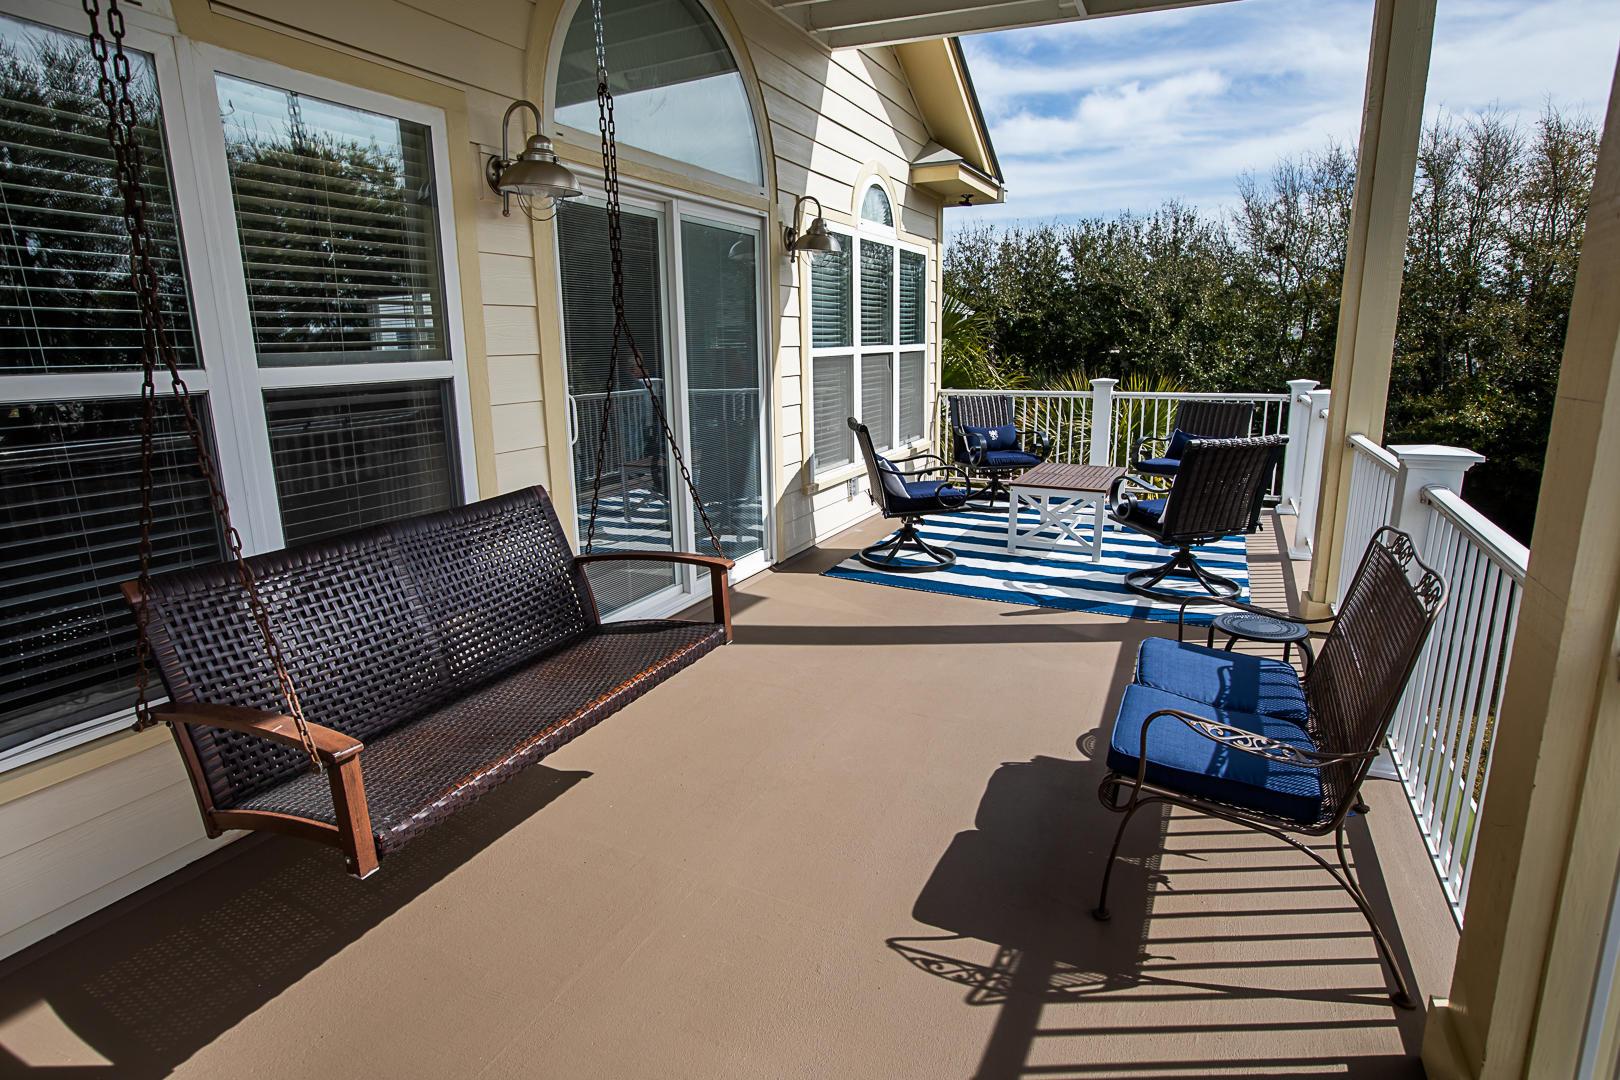 Isle of Palms Homes For Sale - 712 Carolina, Isle of Palms, SC - 25